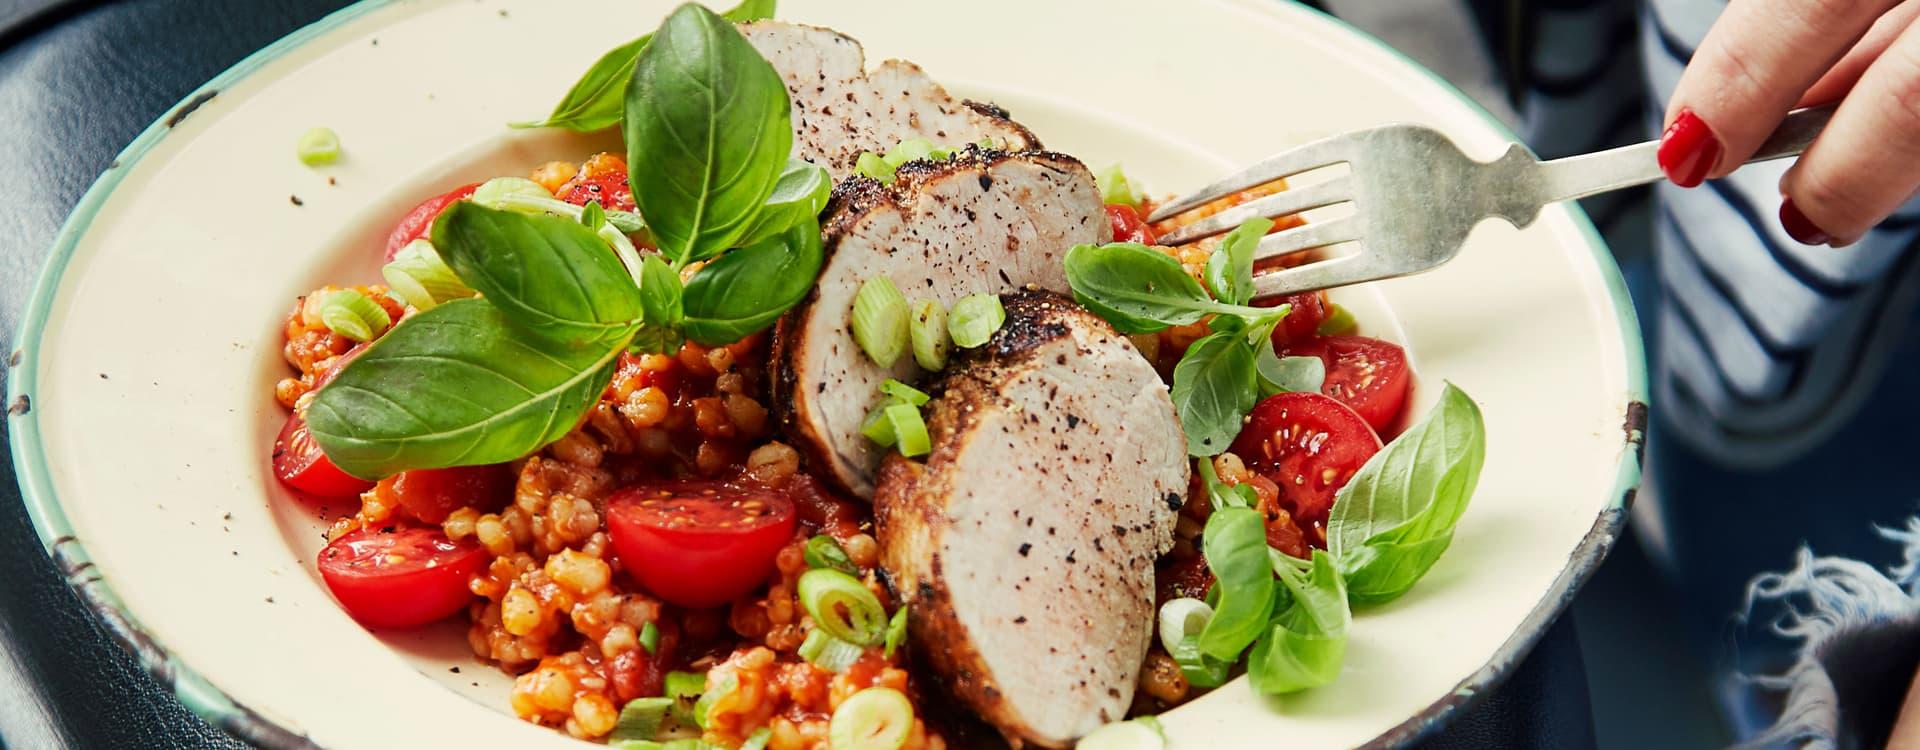 Stekt svinefilet med tomatkokt byggryn og basilikum